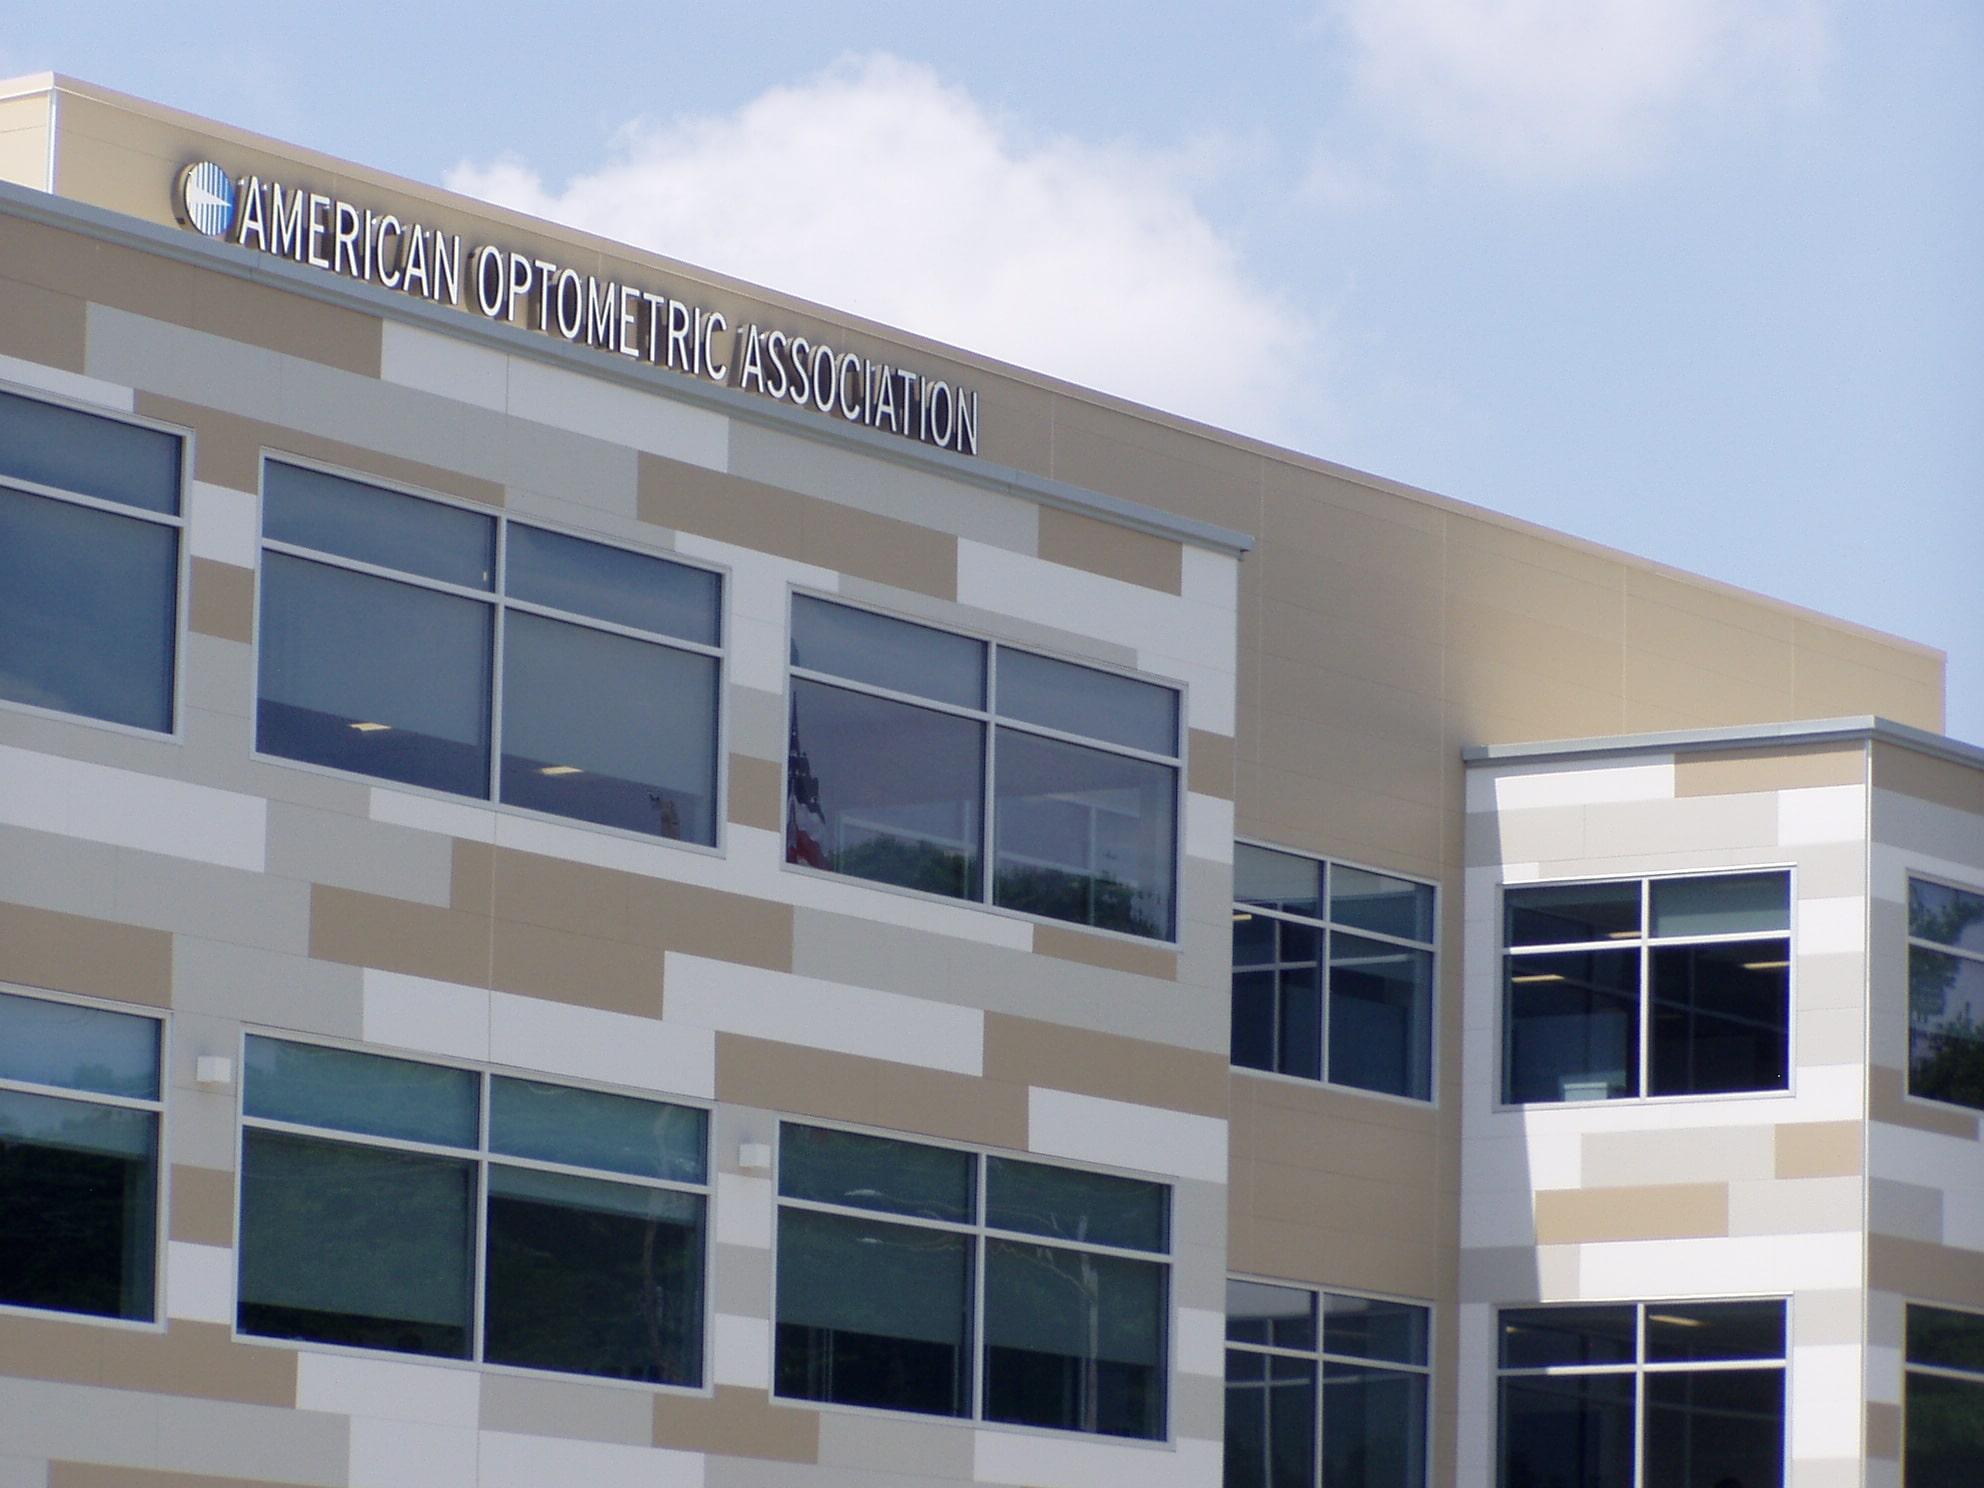 American Optometry Association